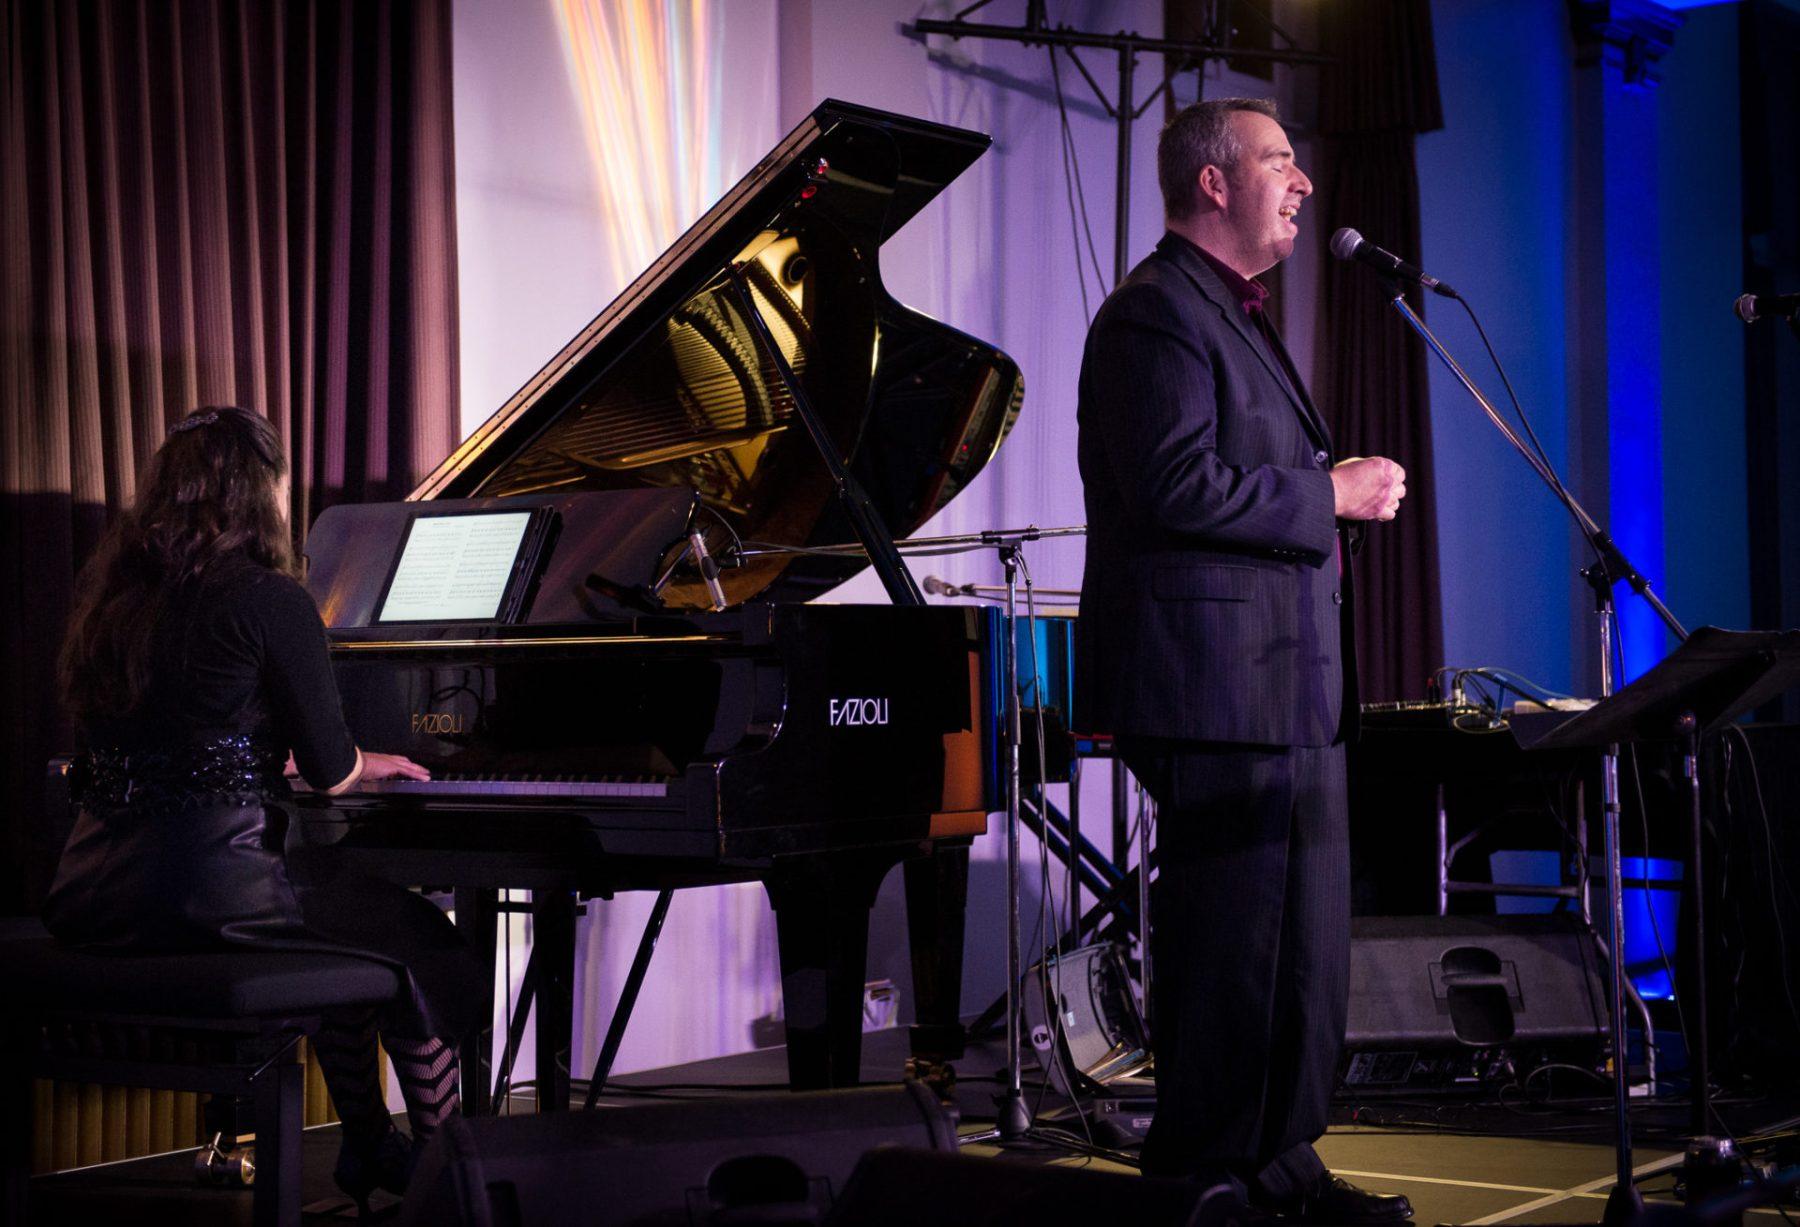 Carman J. Price & Rachel Kiyo Iwaasa, Music for the Winter Solstice 2017